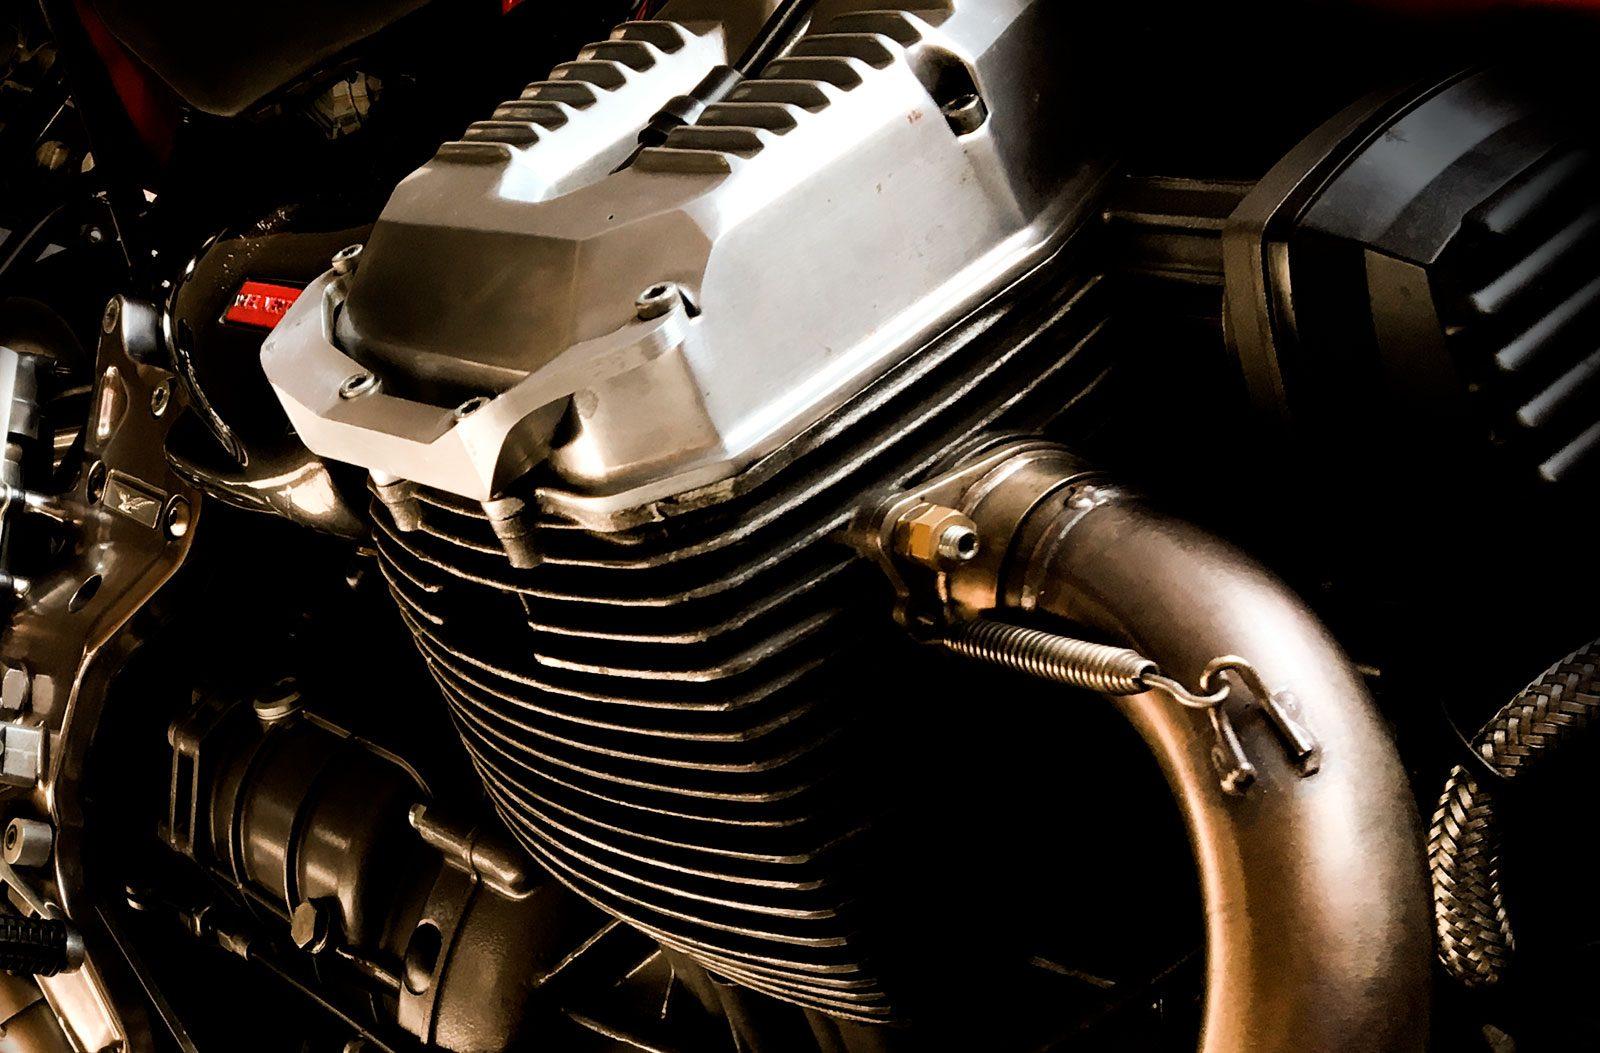 alberto sala writer pictures motorcycles moto guzzi